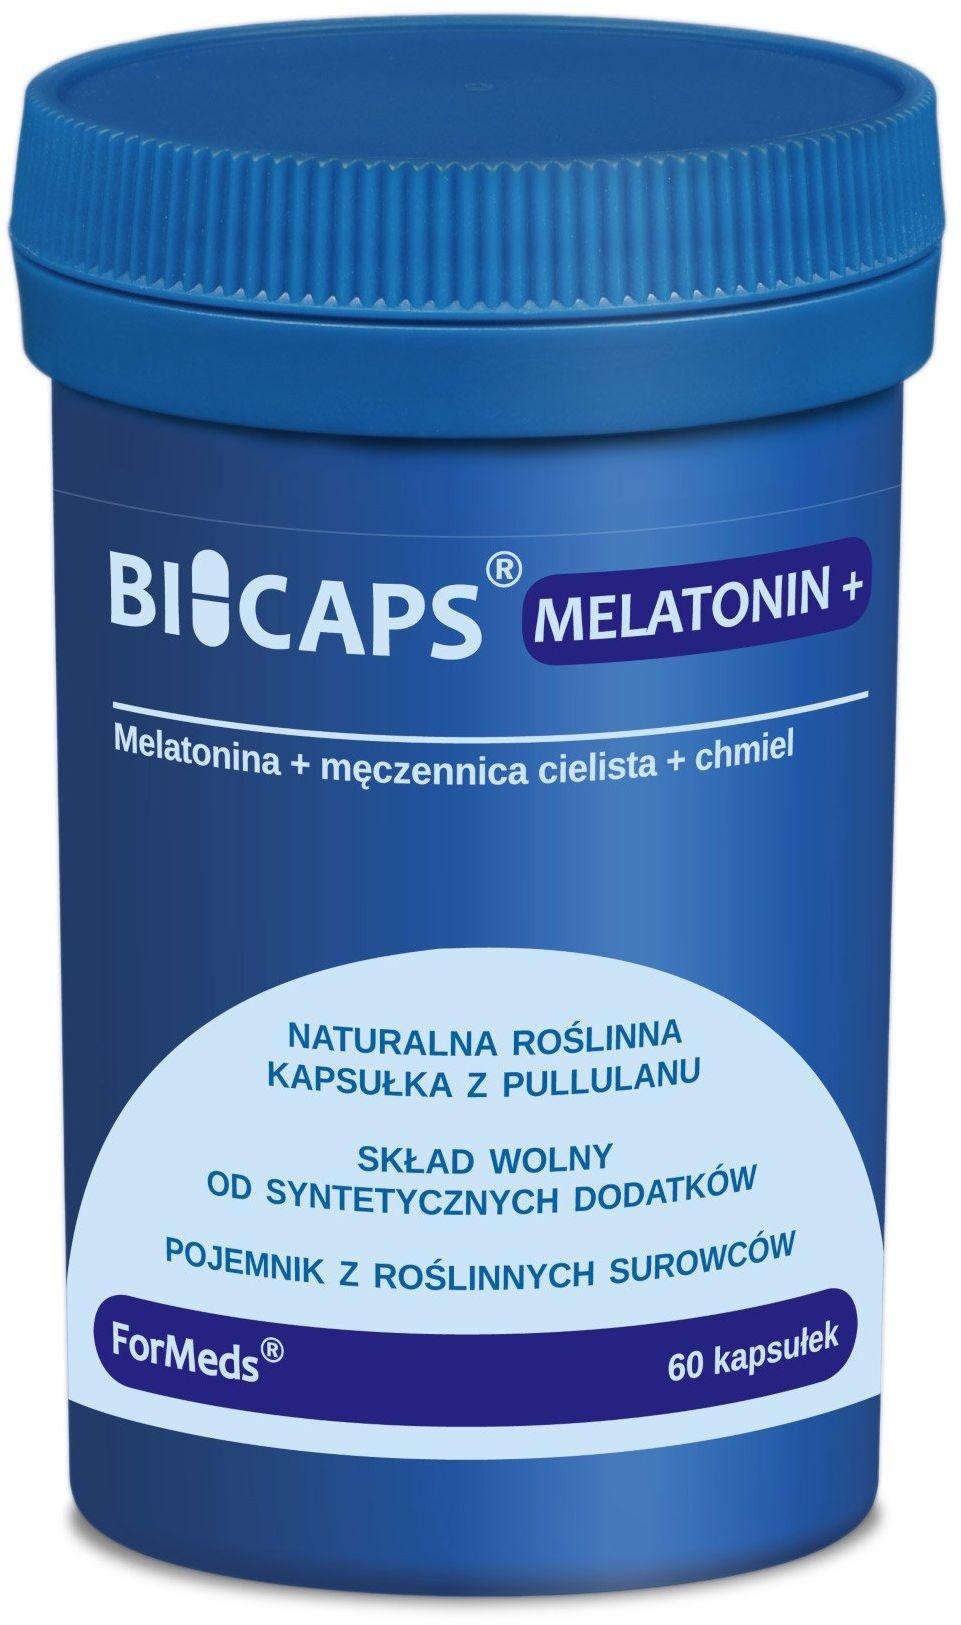 BICAPS Melatonin+ Męczennica cielista Chmiel Melatonina (60 kaps) ForMeds